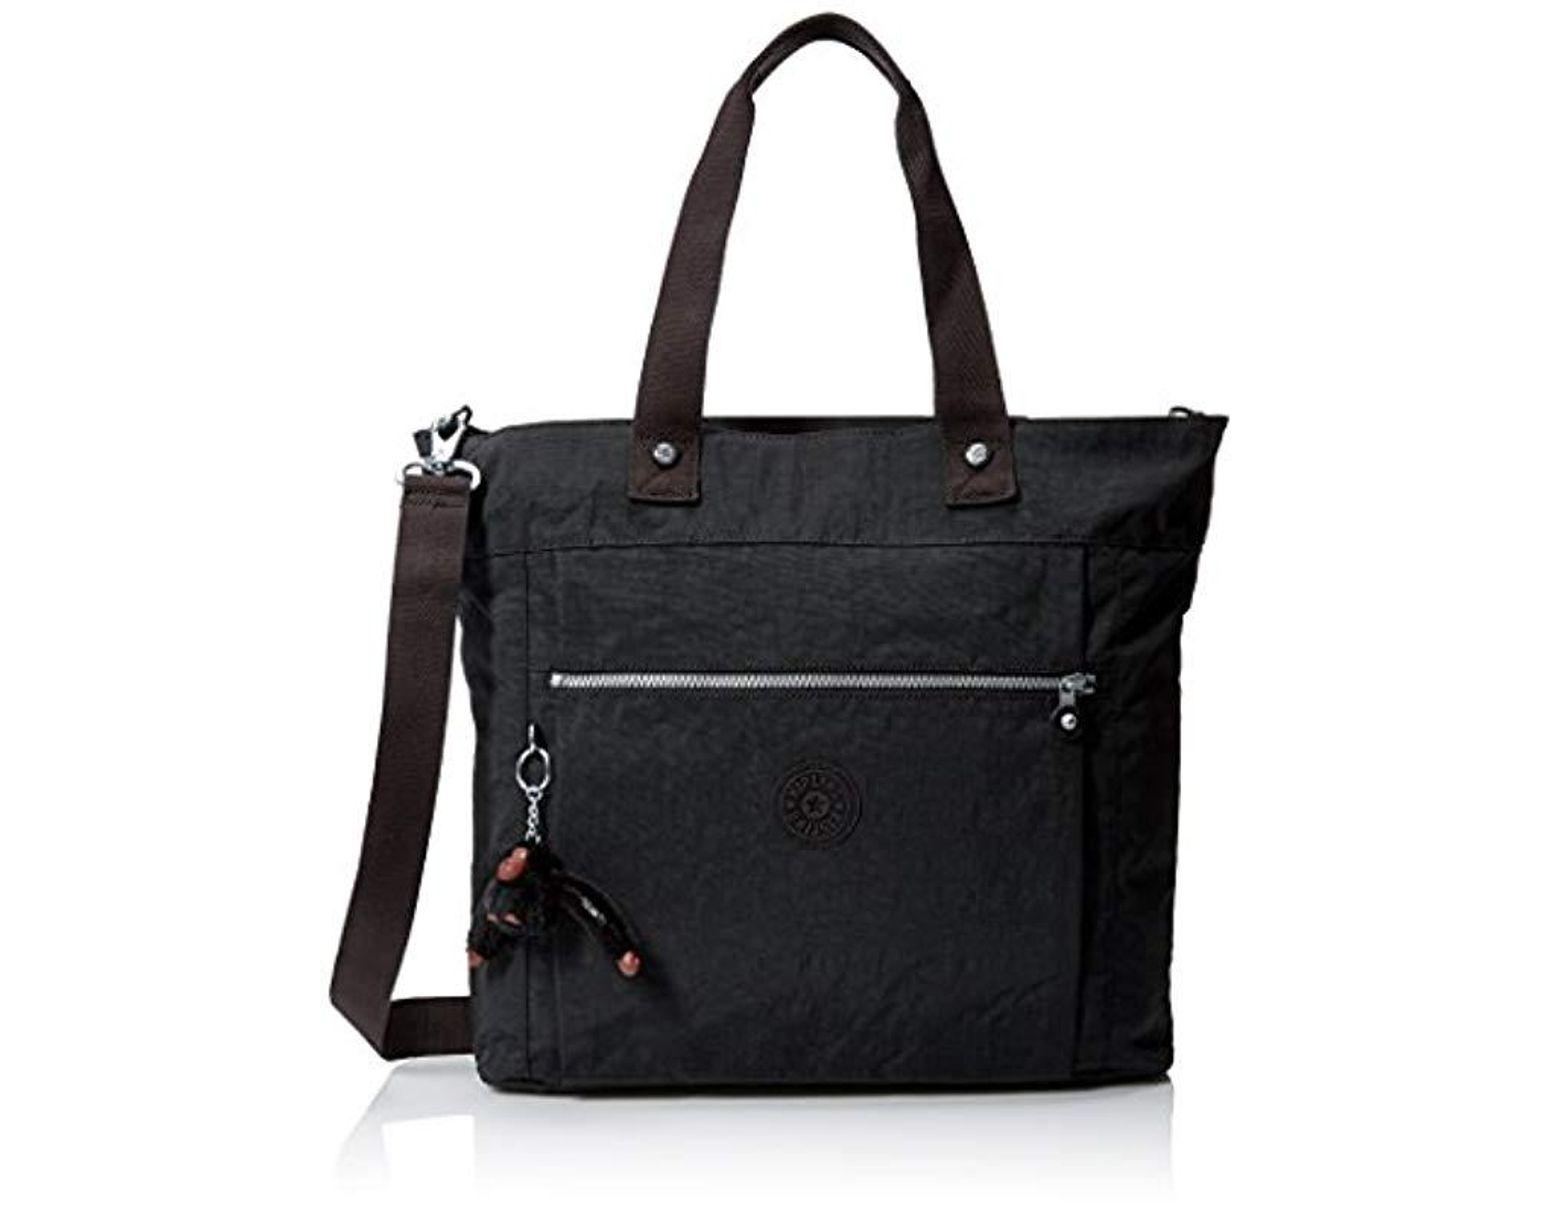 a4ed737e83a Kipling Lizzie Solid Travel Laptop Tote Shoulder Bag in Black - Save 4% -  Lyst